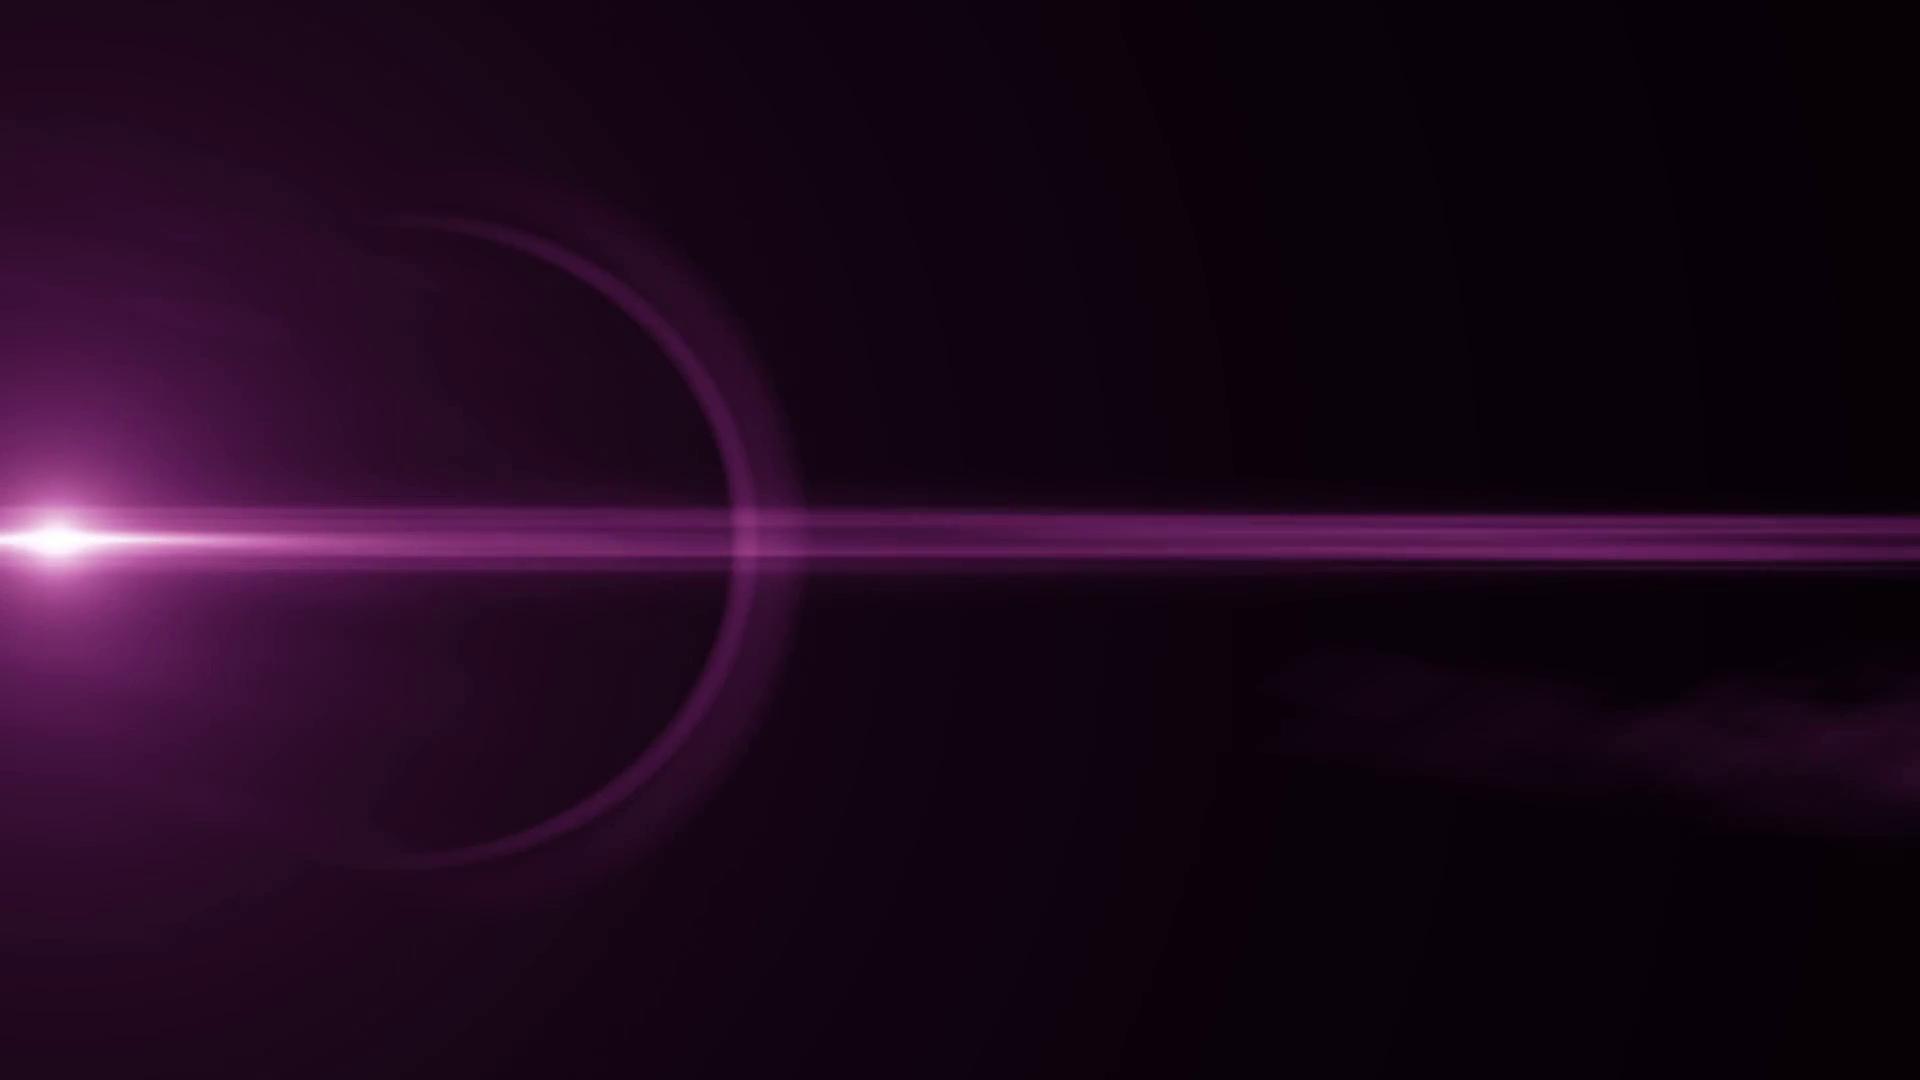 Purple lens flare photo